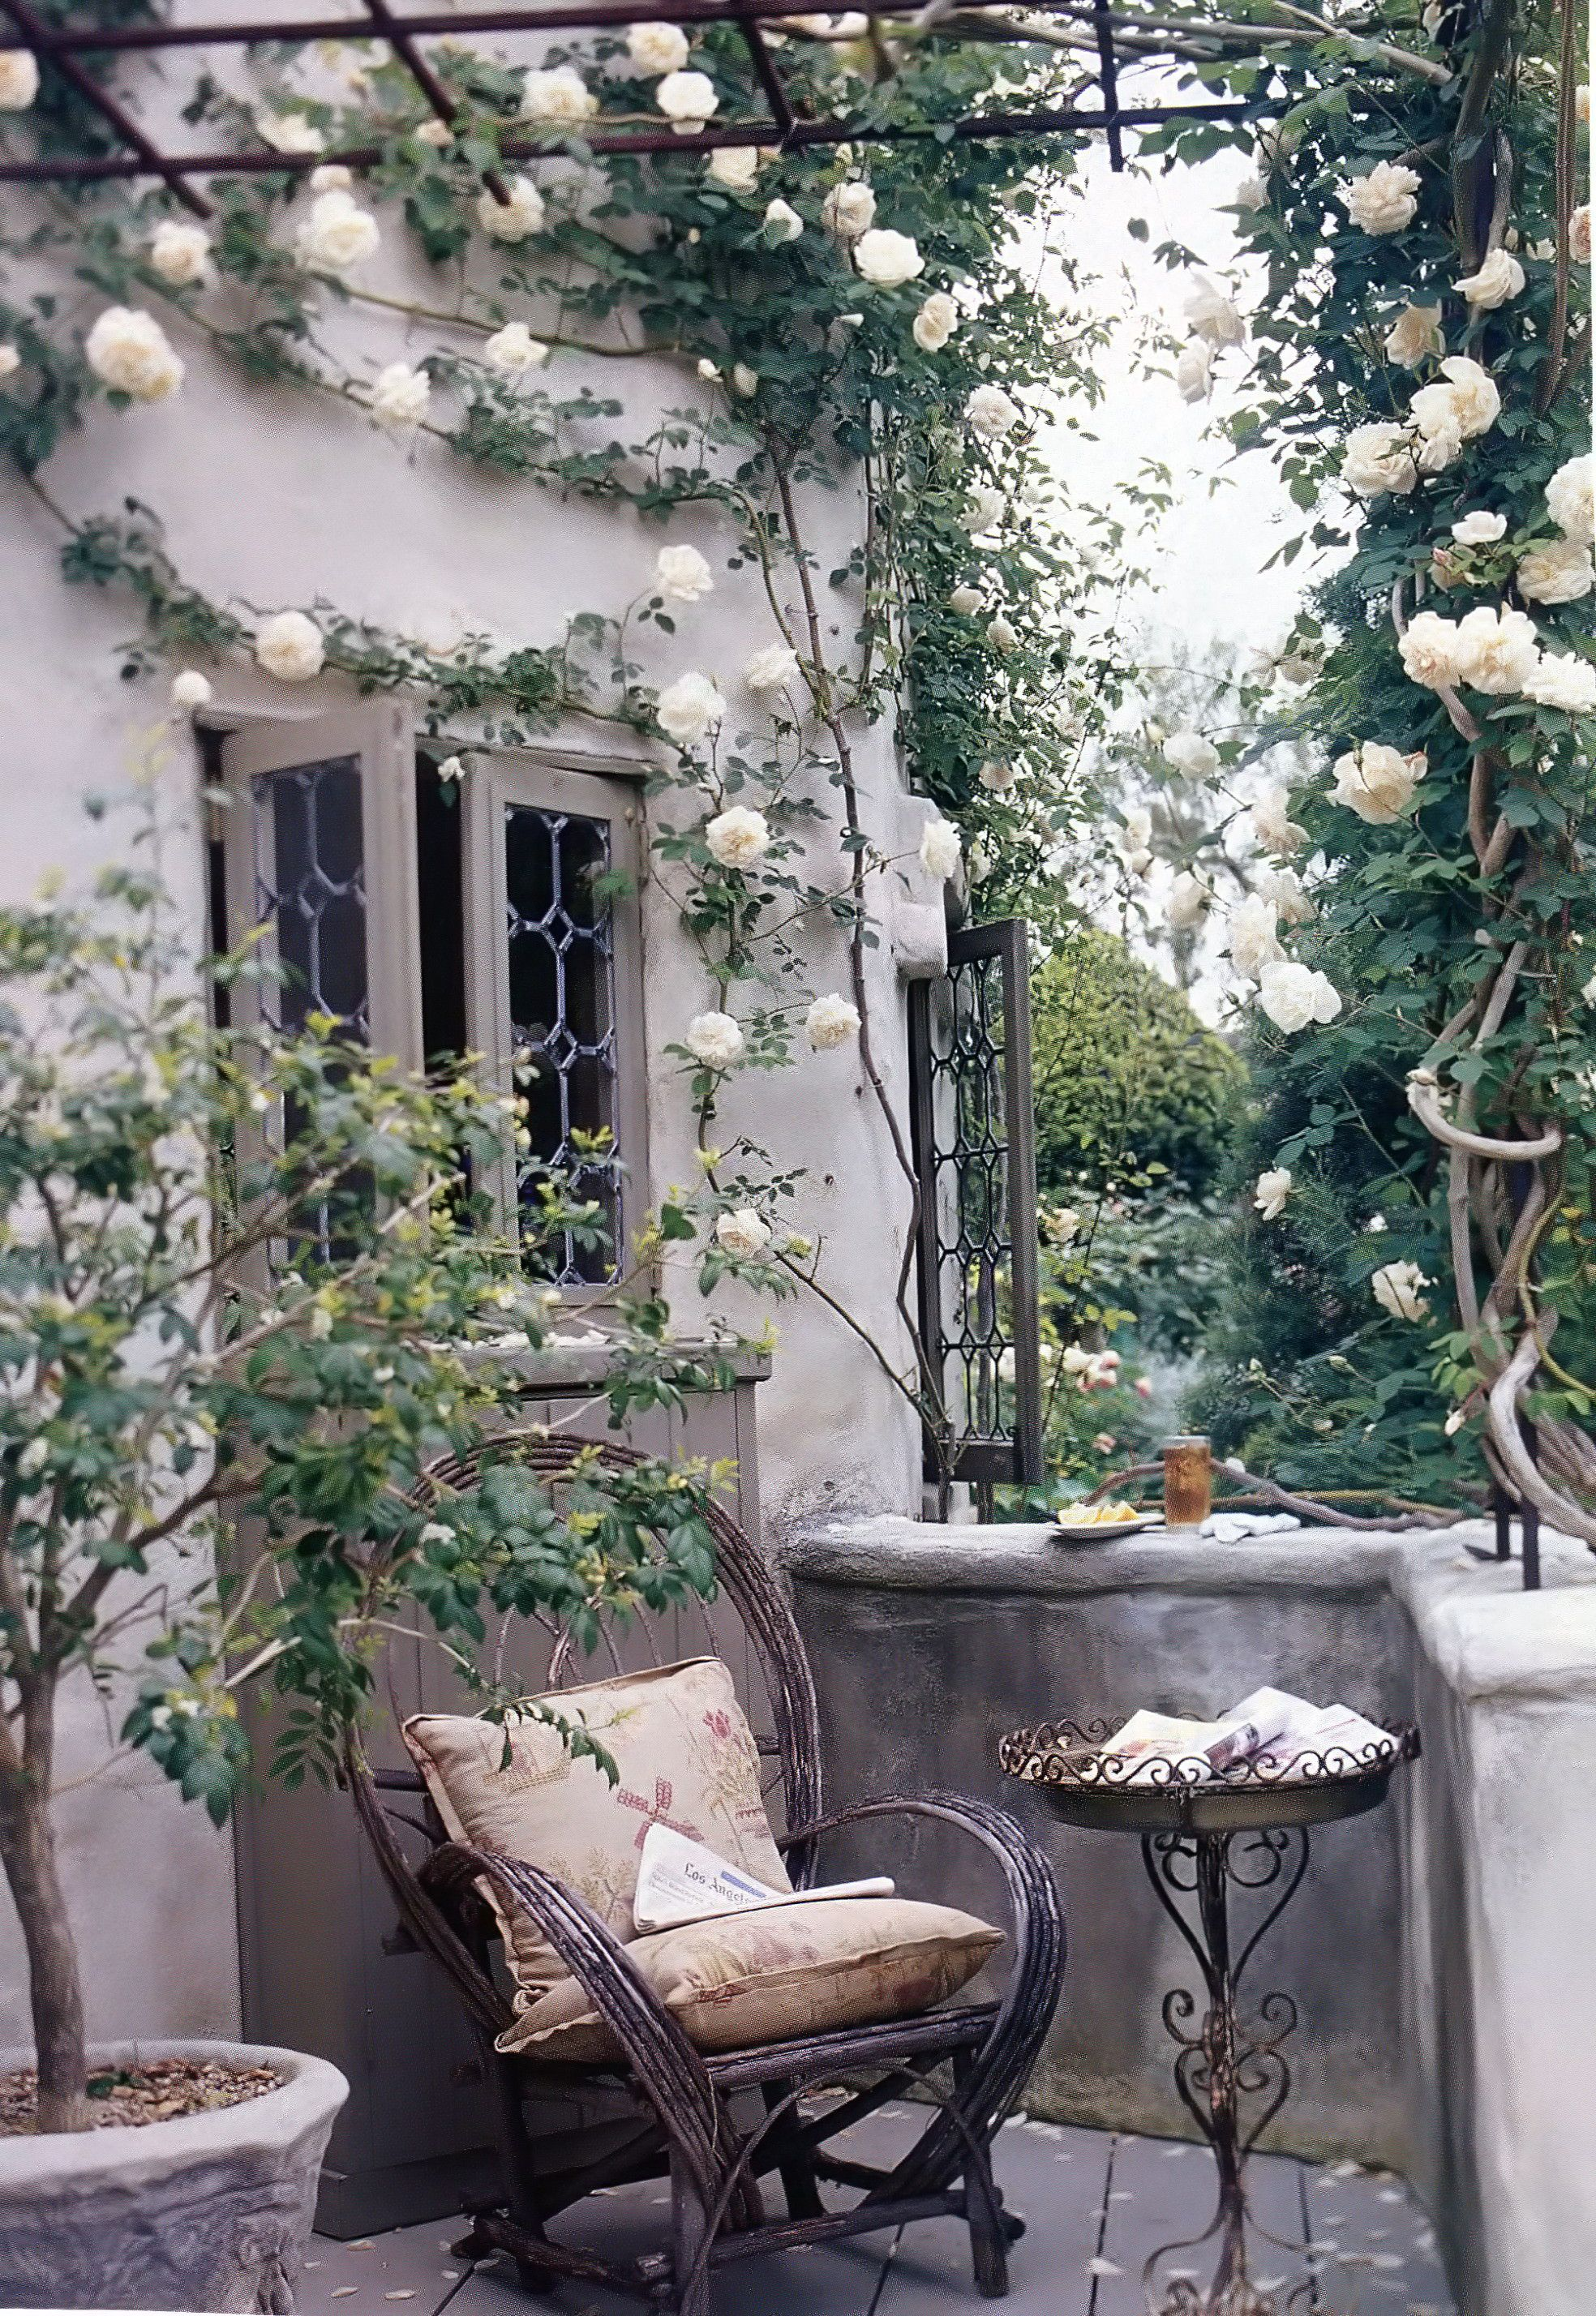 Pin By Sylvie Mesples On Small Balcony Organization Cottage Garden Design Cottage Garden Landscape Design